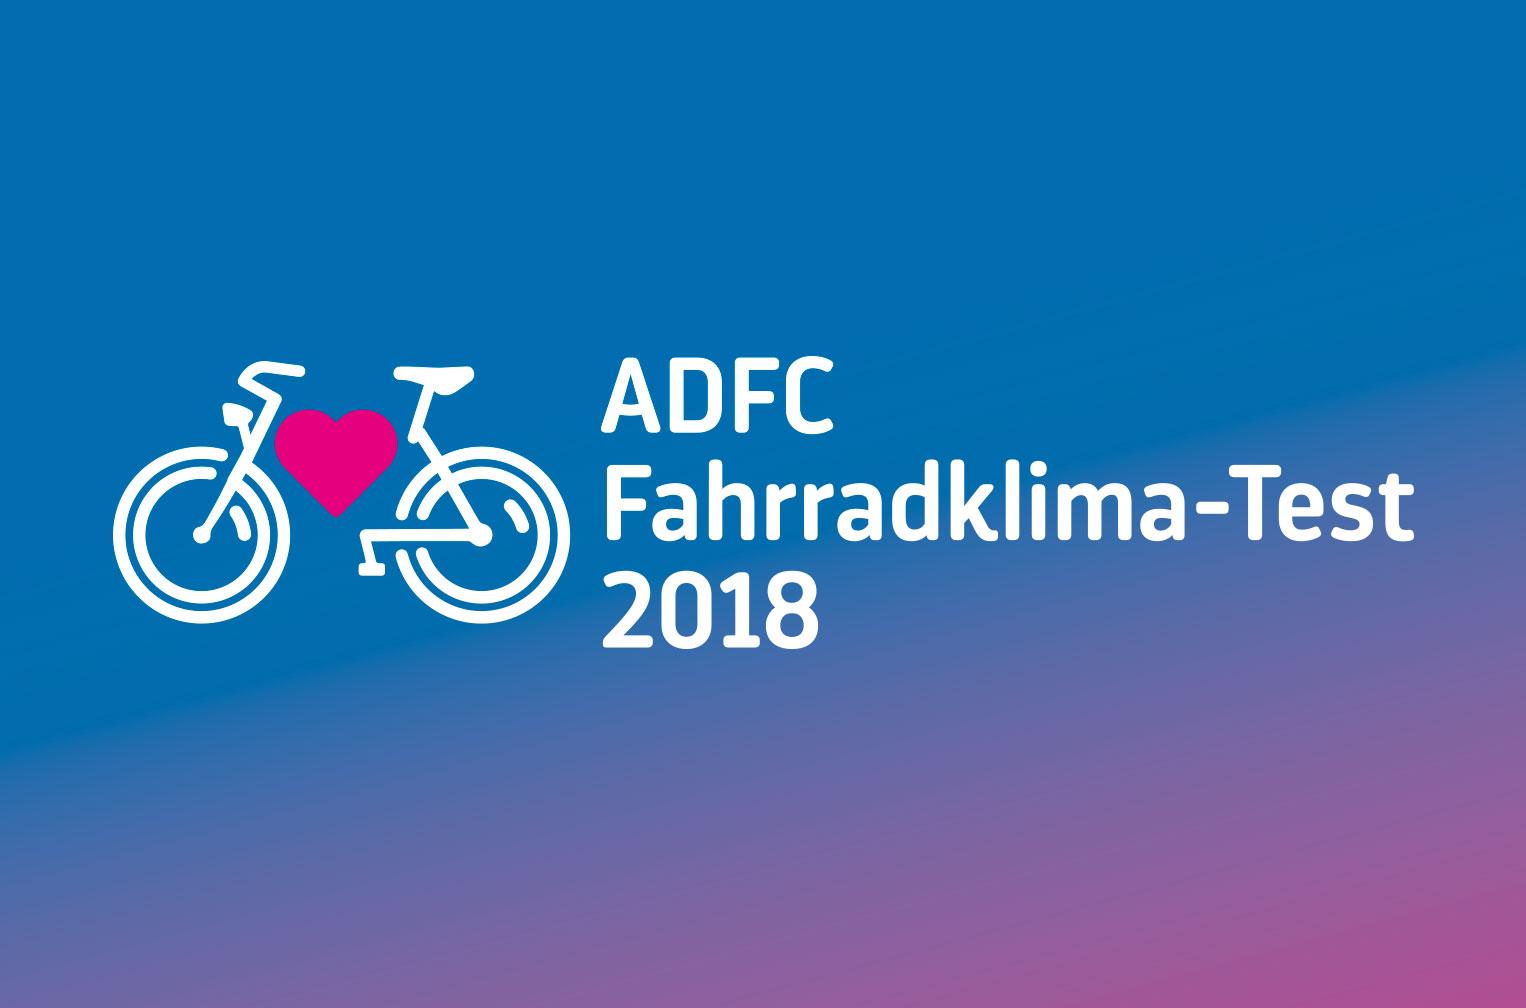 ADFC Fahrradklima-Test 2018